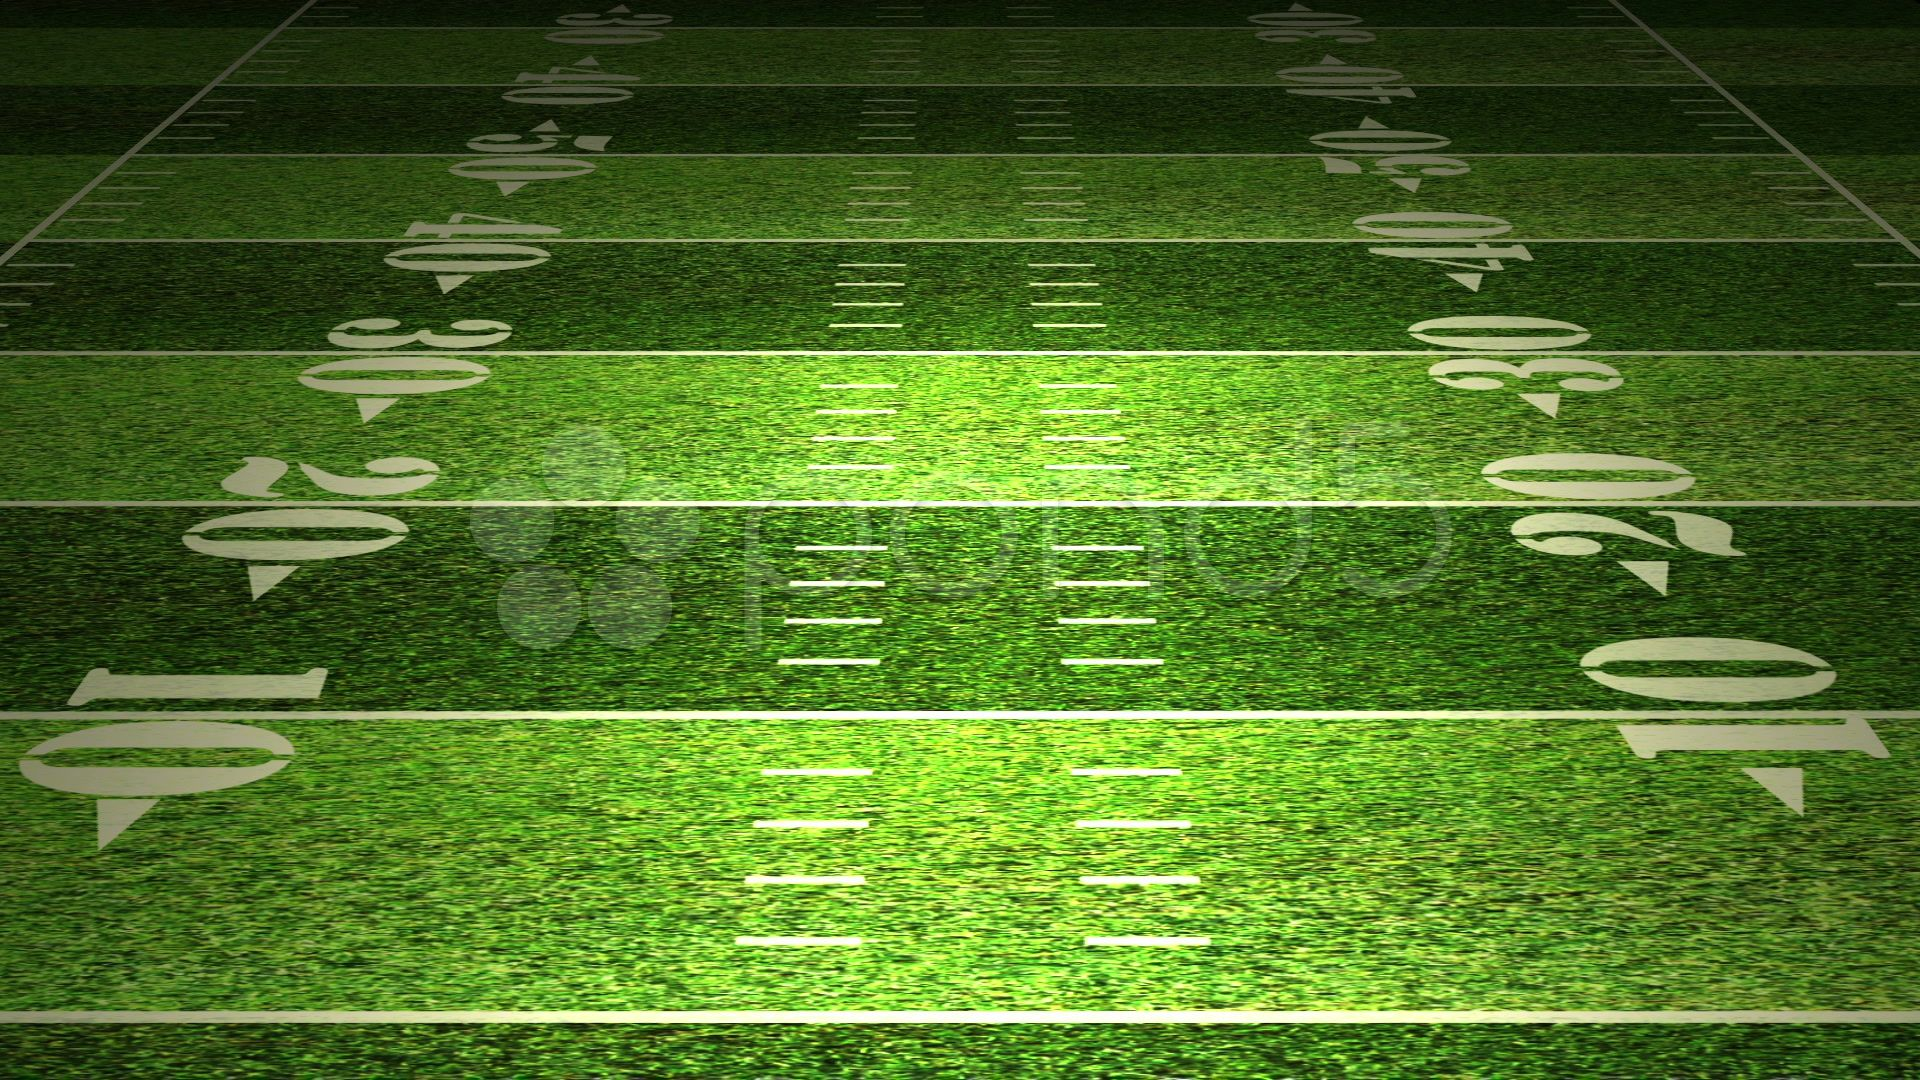 Football Field Wallpaper 1920x1080